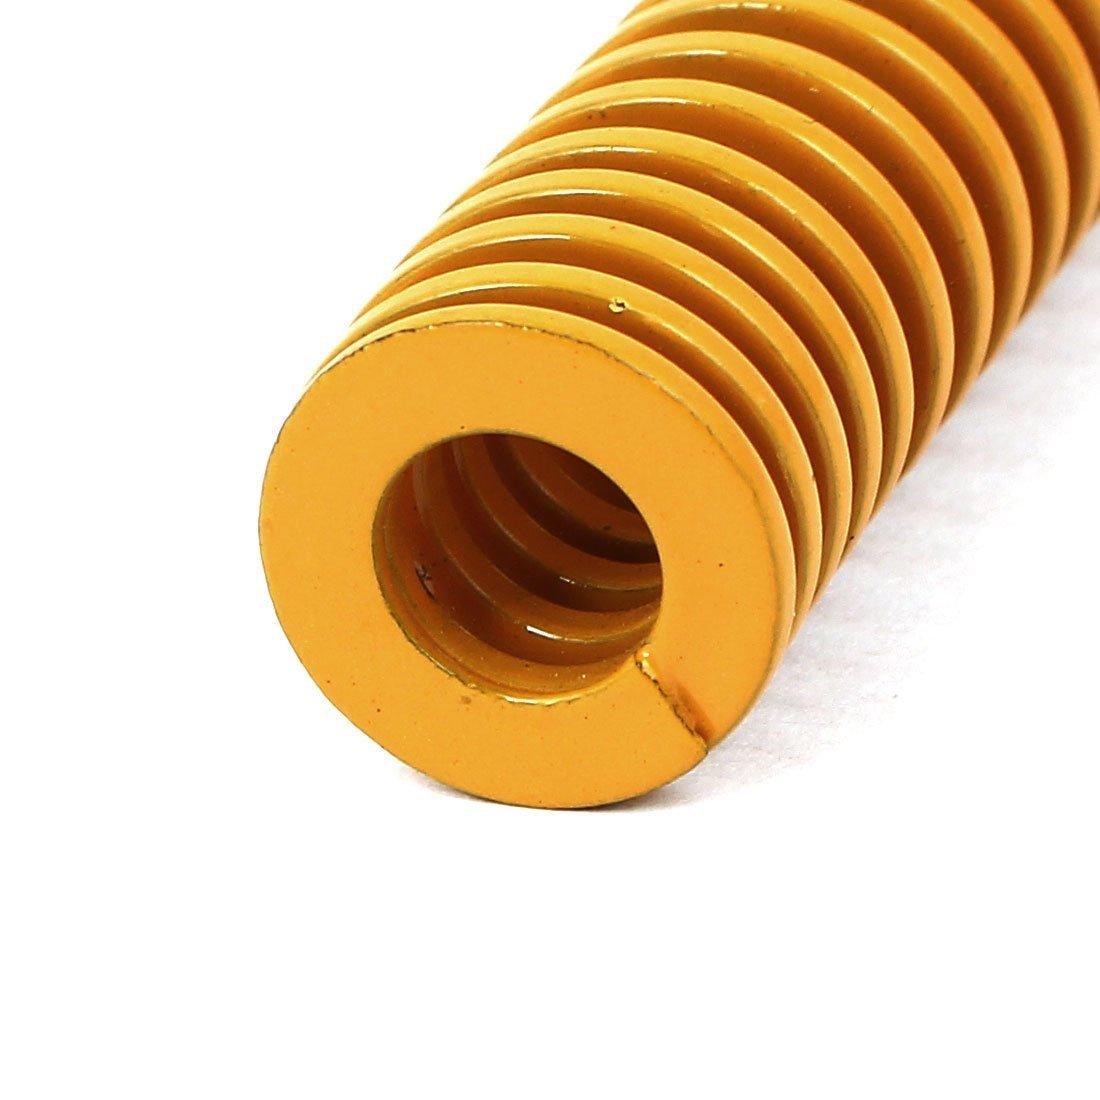 DealMux 16 milímetros x 75 milímetros Seção Tubular Mold Mold Die Primavera Amarelo: Amazon.com: Industrial & Scientific